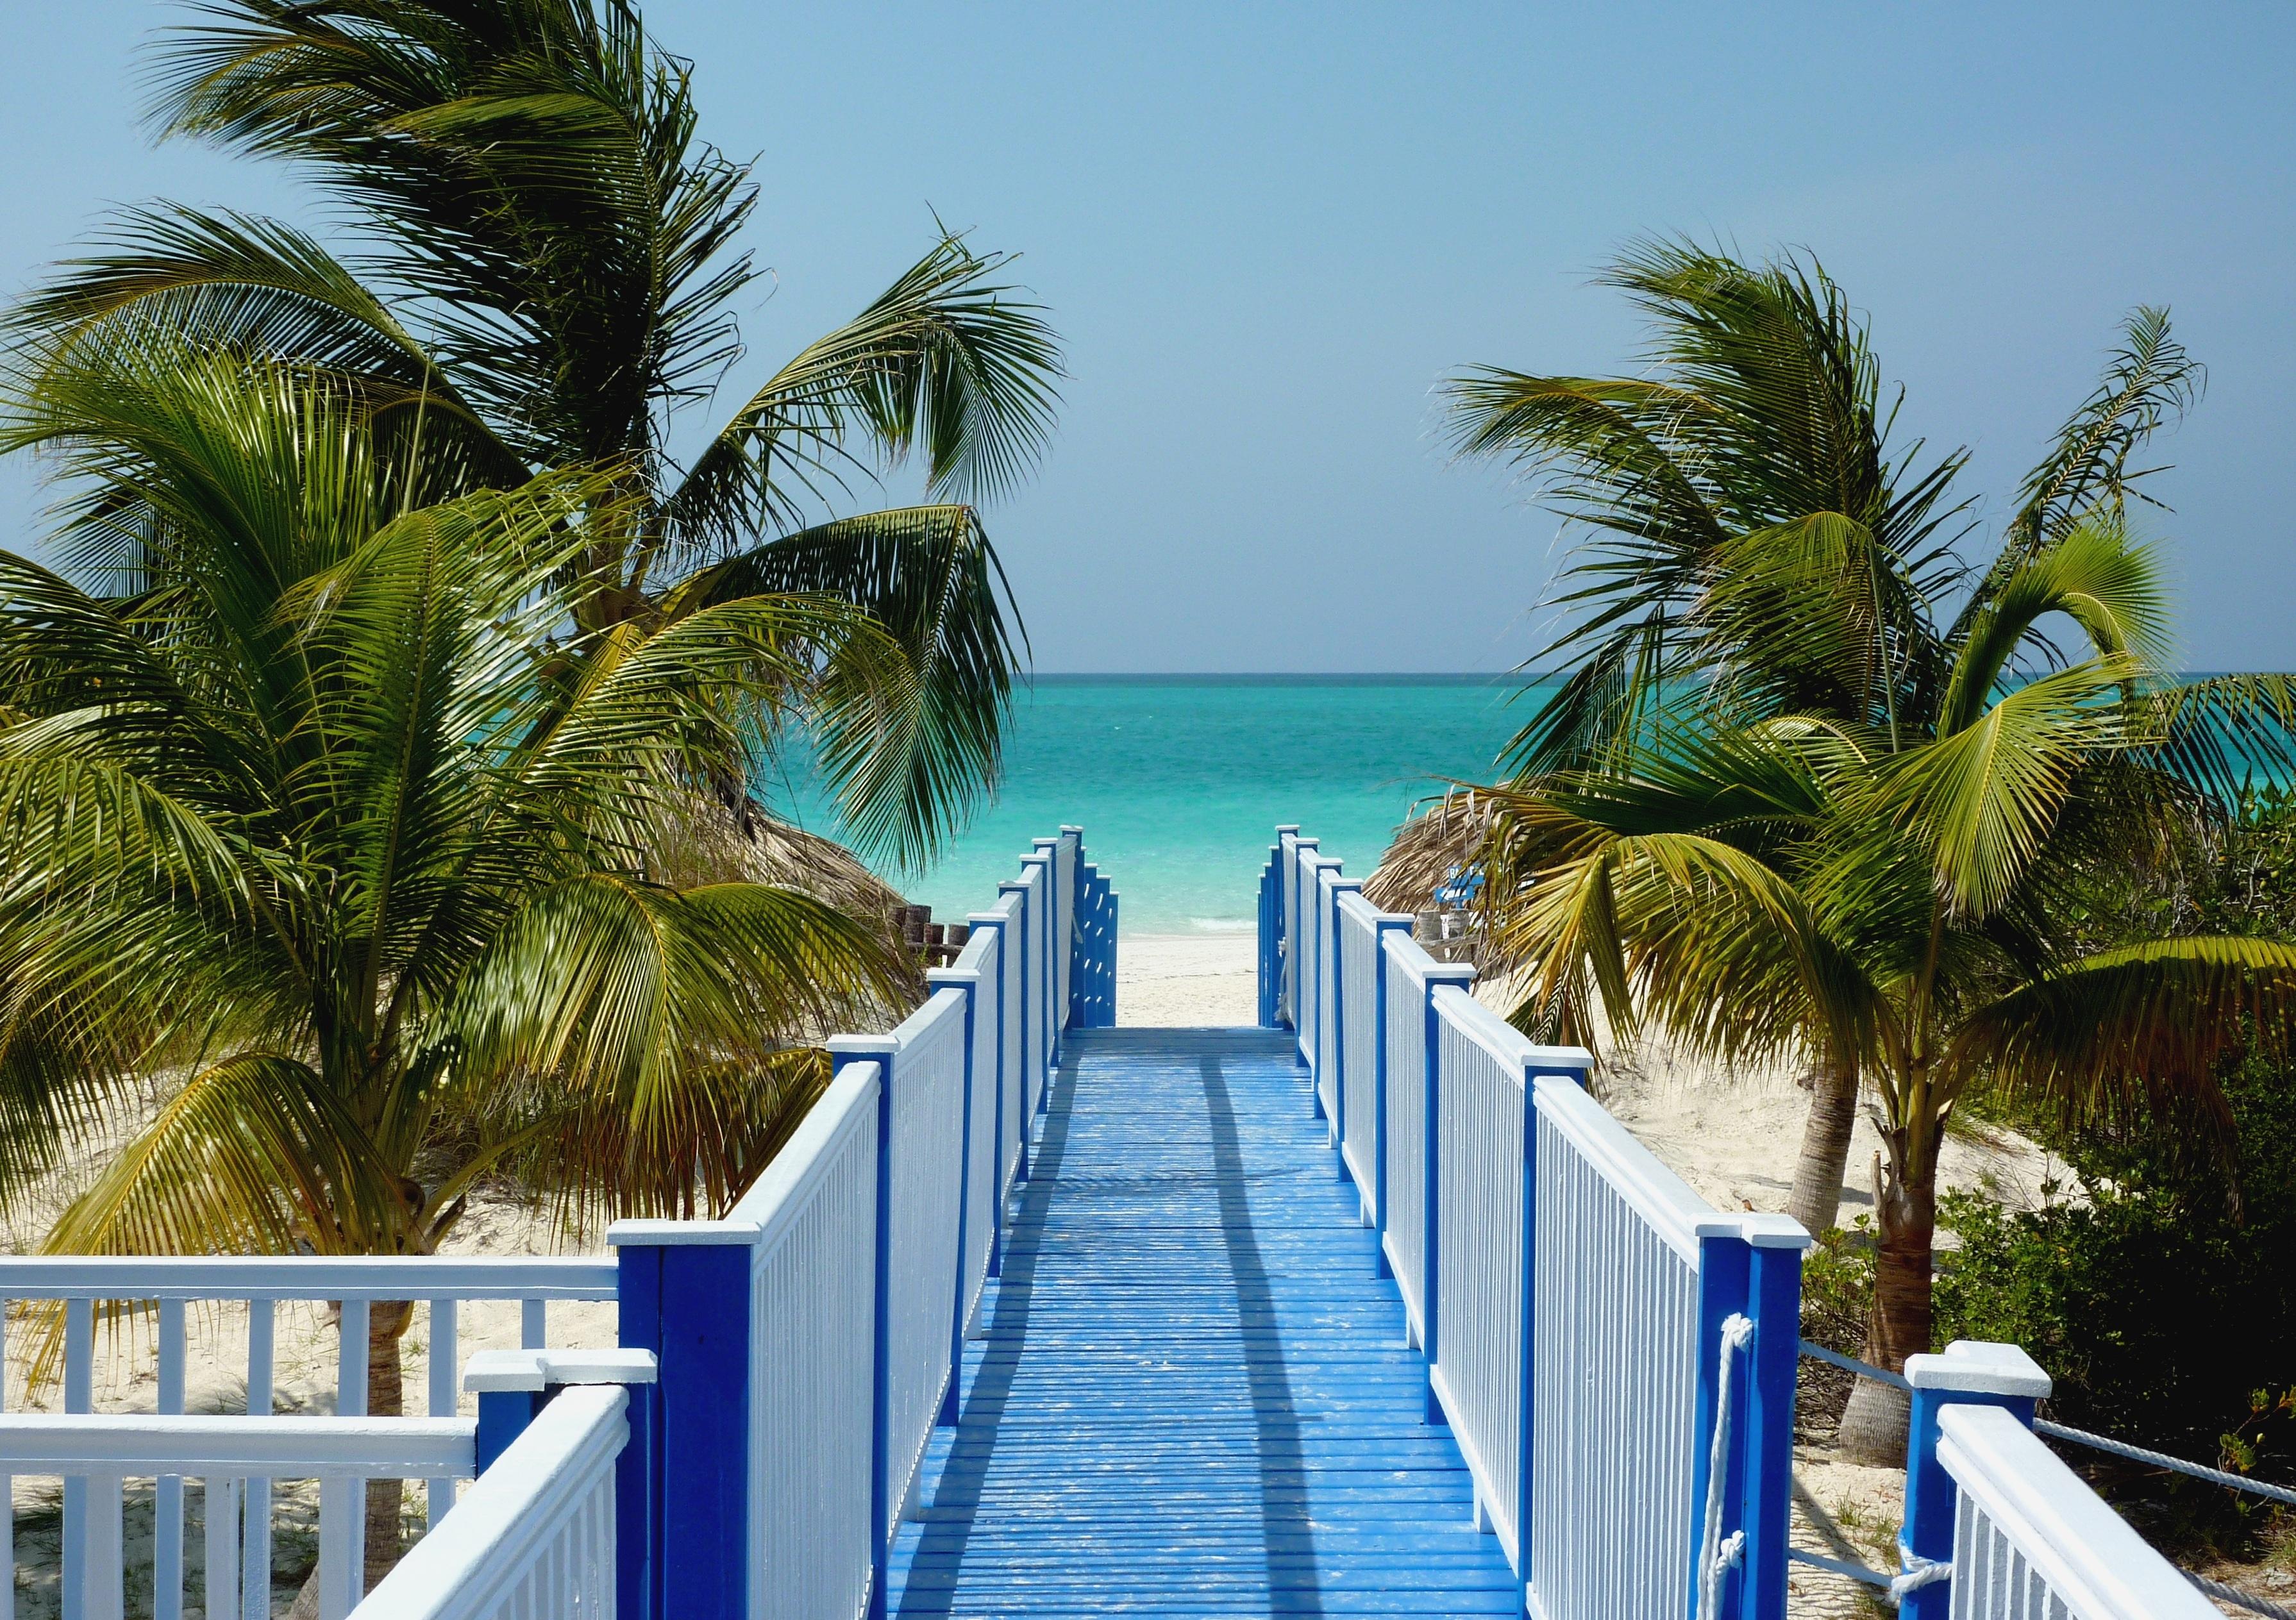 Beach Sea Ocean Villa Summer Vacation Web Swimming Pool Holiday Bay Property Cuba Resort Estate Caribbean